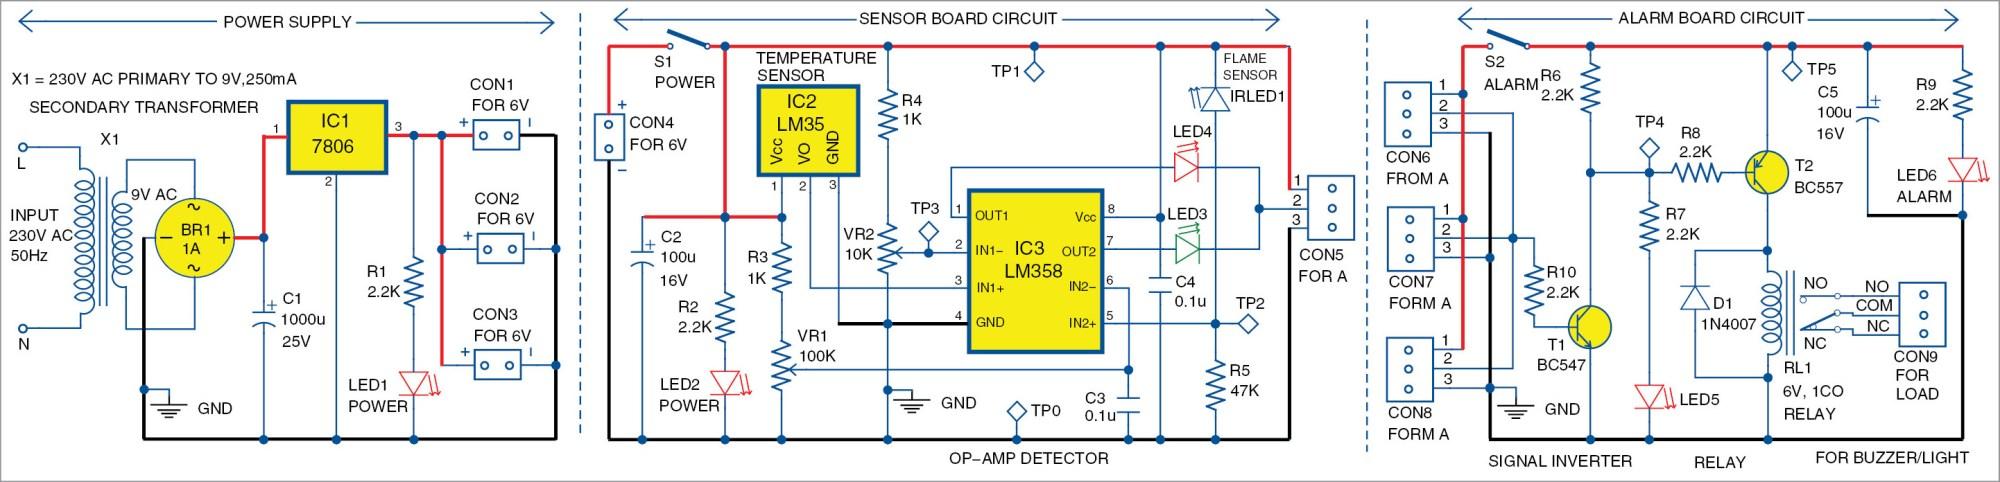 hight resolution of fire alarm circuit diagram